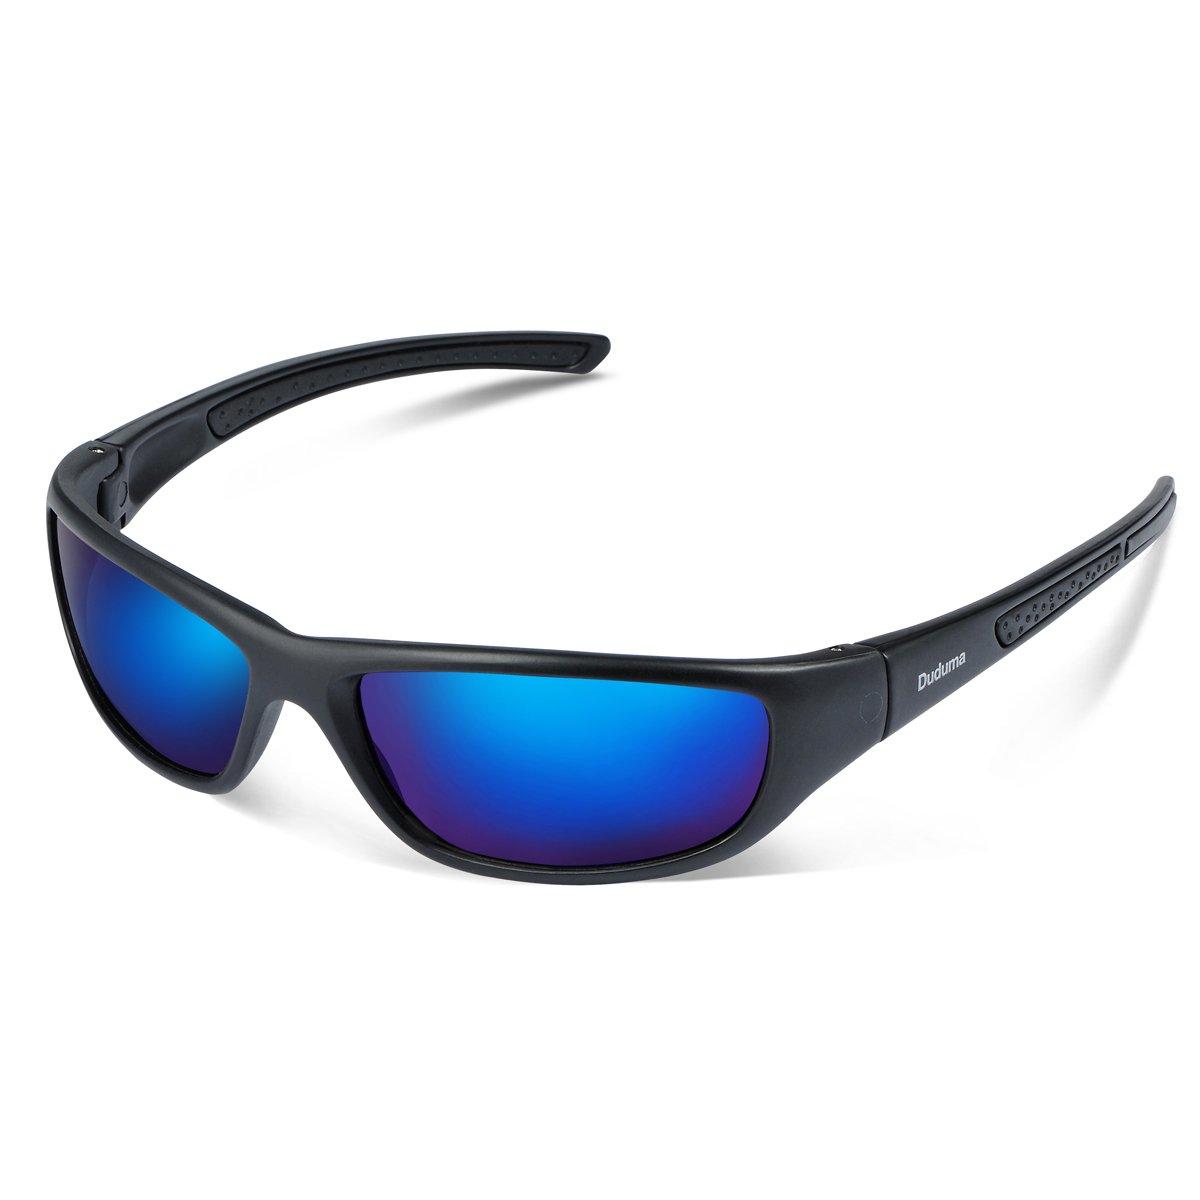 c2e0df053f7 Duduma Polarized Sports Sunglasses for Men Women Baseball Running Cycling  Fishing Driving Golf Softball Hiking Sun Glasses Tr8116